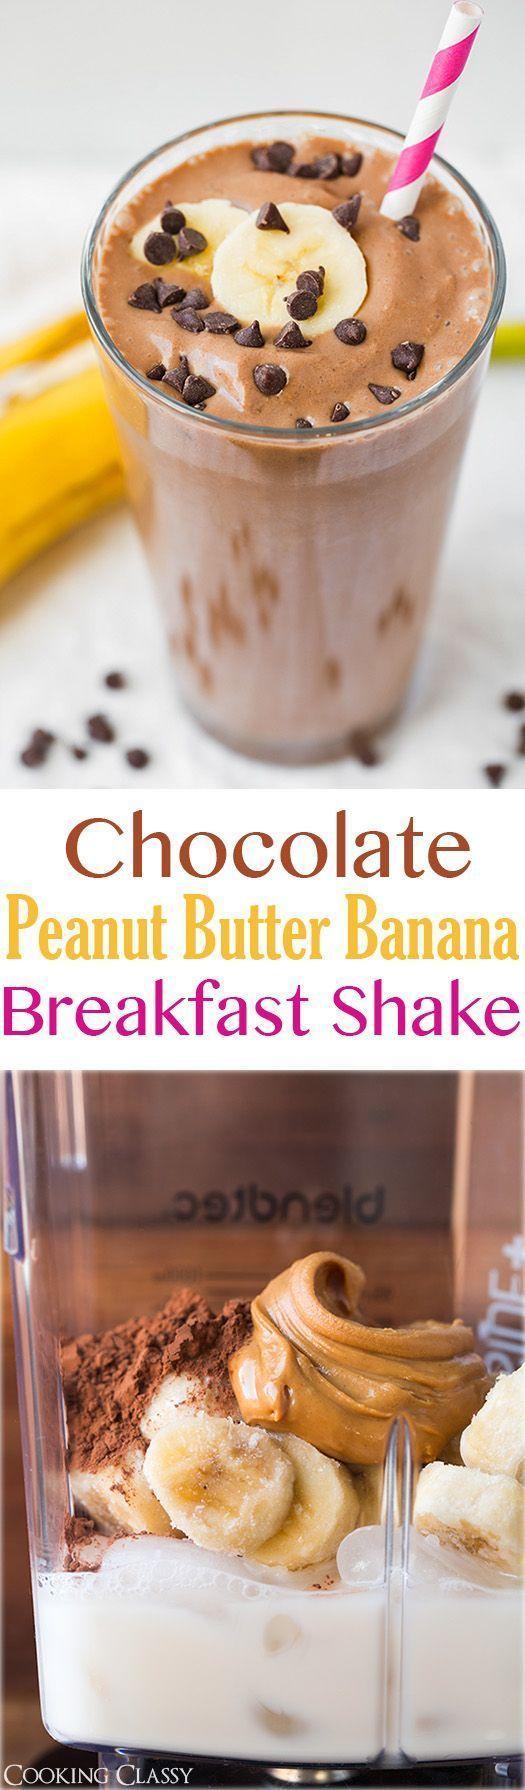 Chocolate Peanut Butter Banana Breakfast Shake - healthy, easy to ...